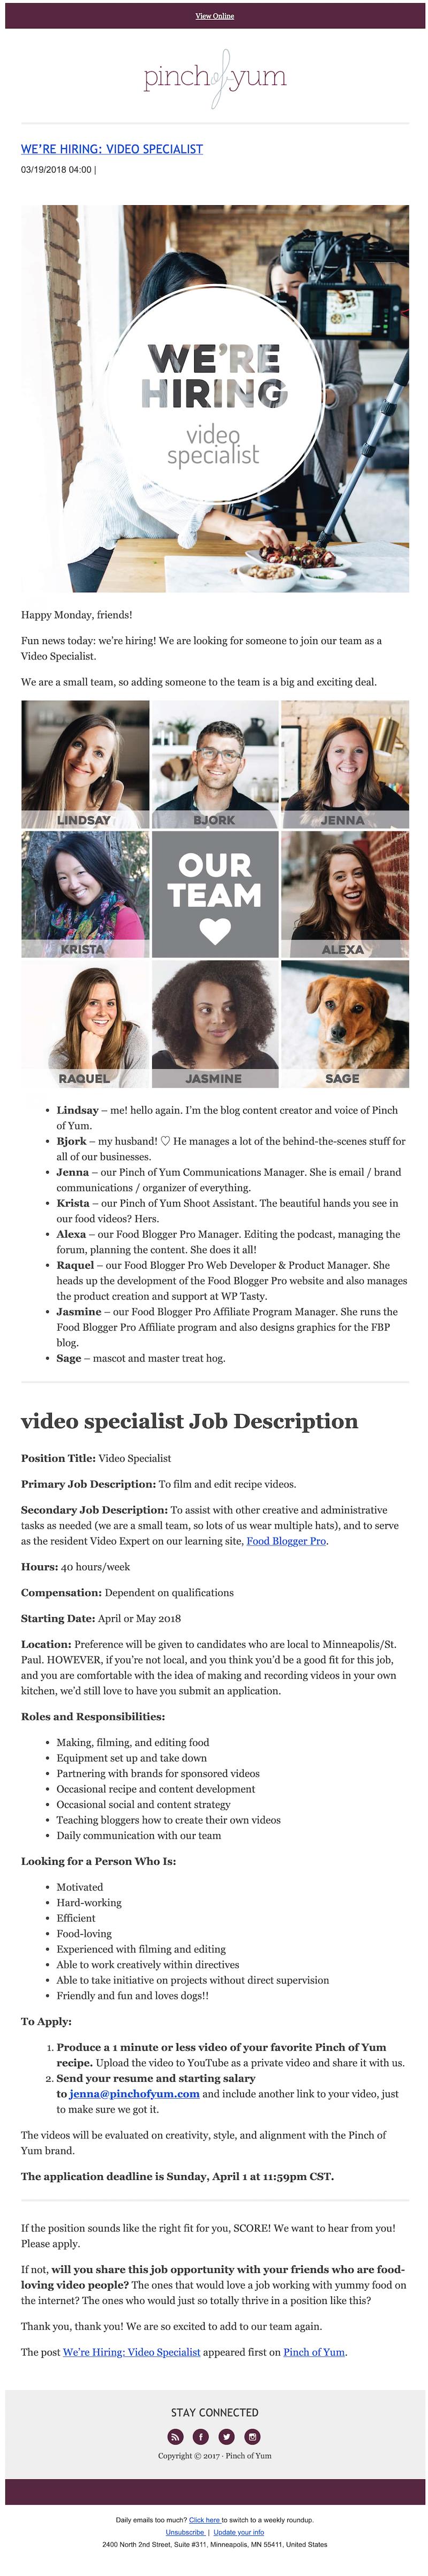 employer branding email idea